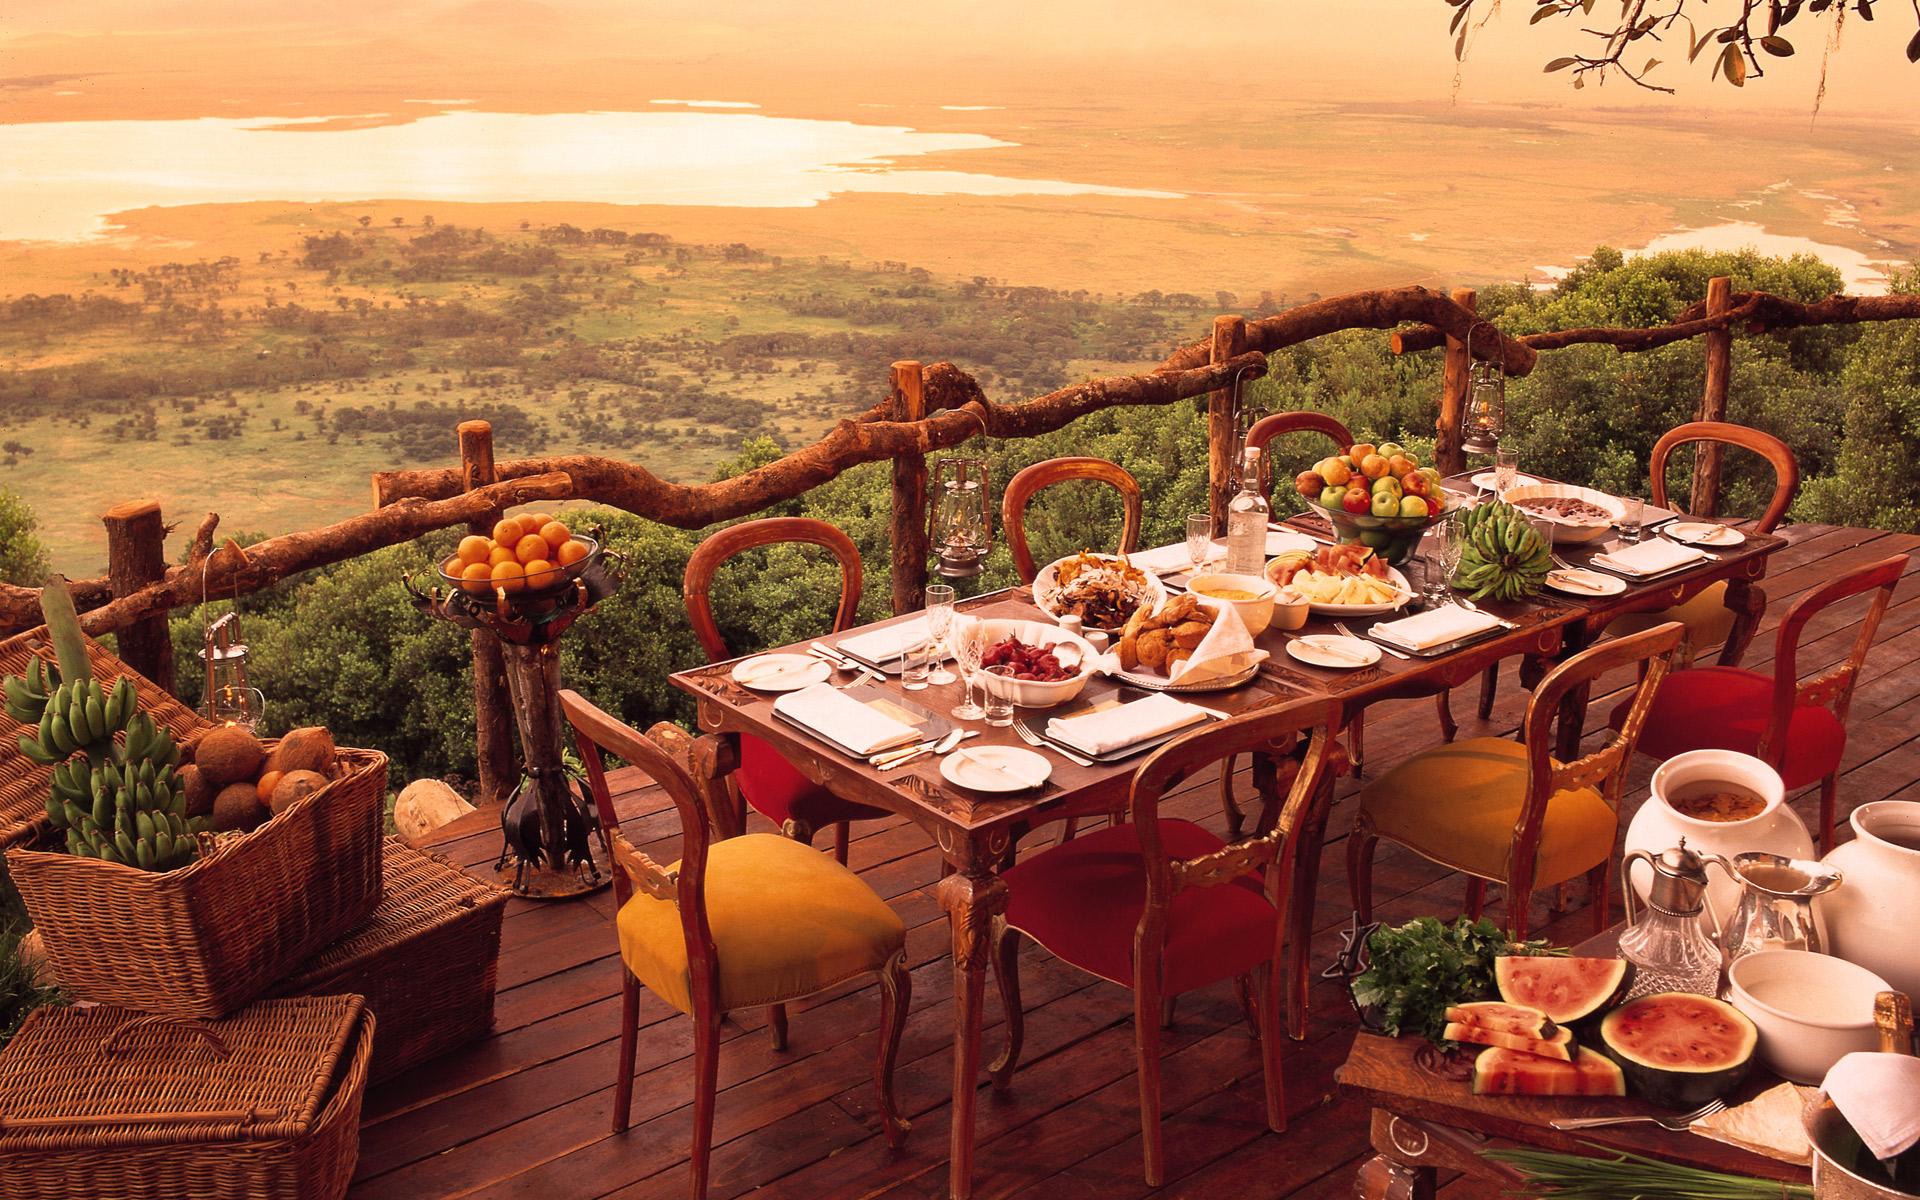 & Beyond's Crater Lodge - Ngorongoro Tanzania